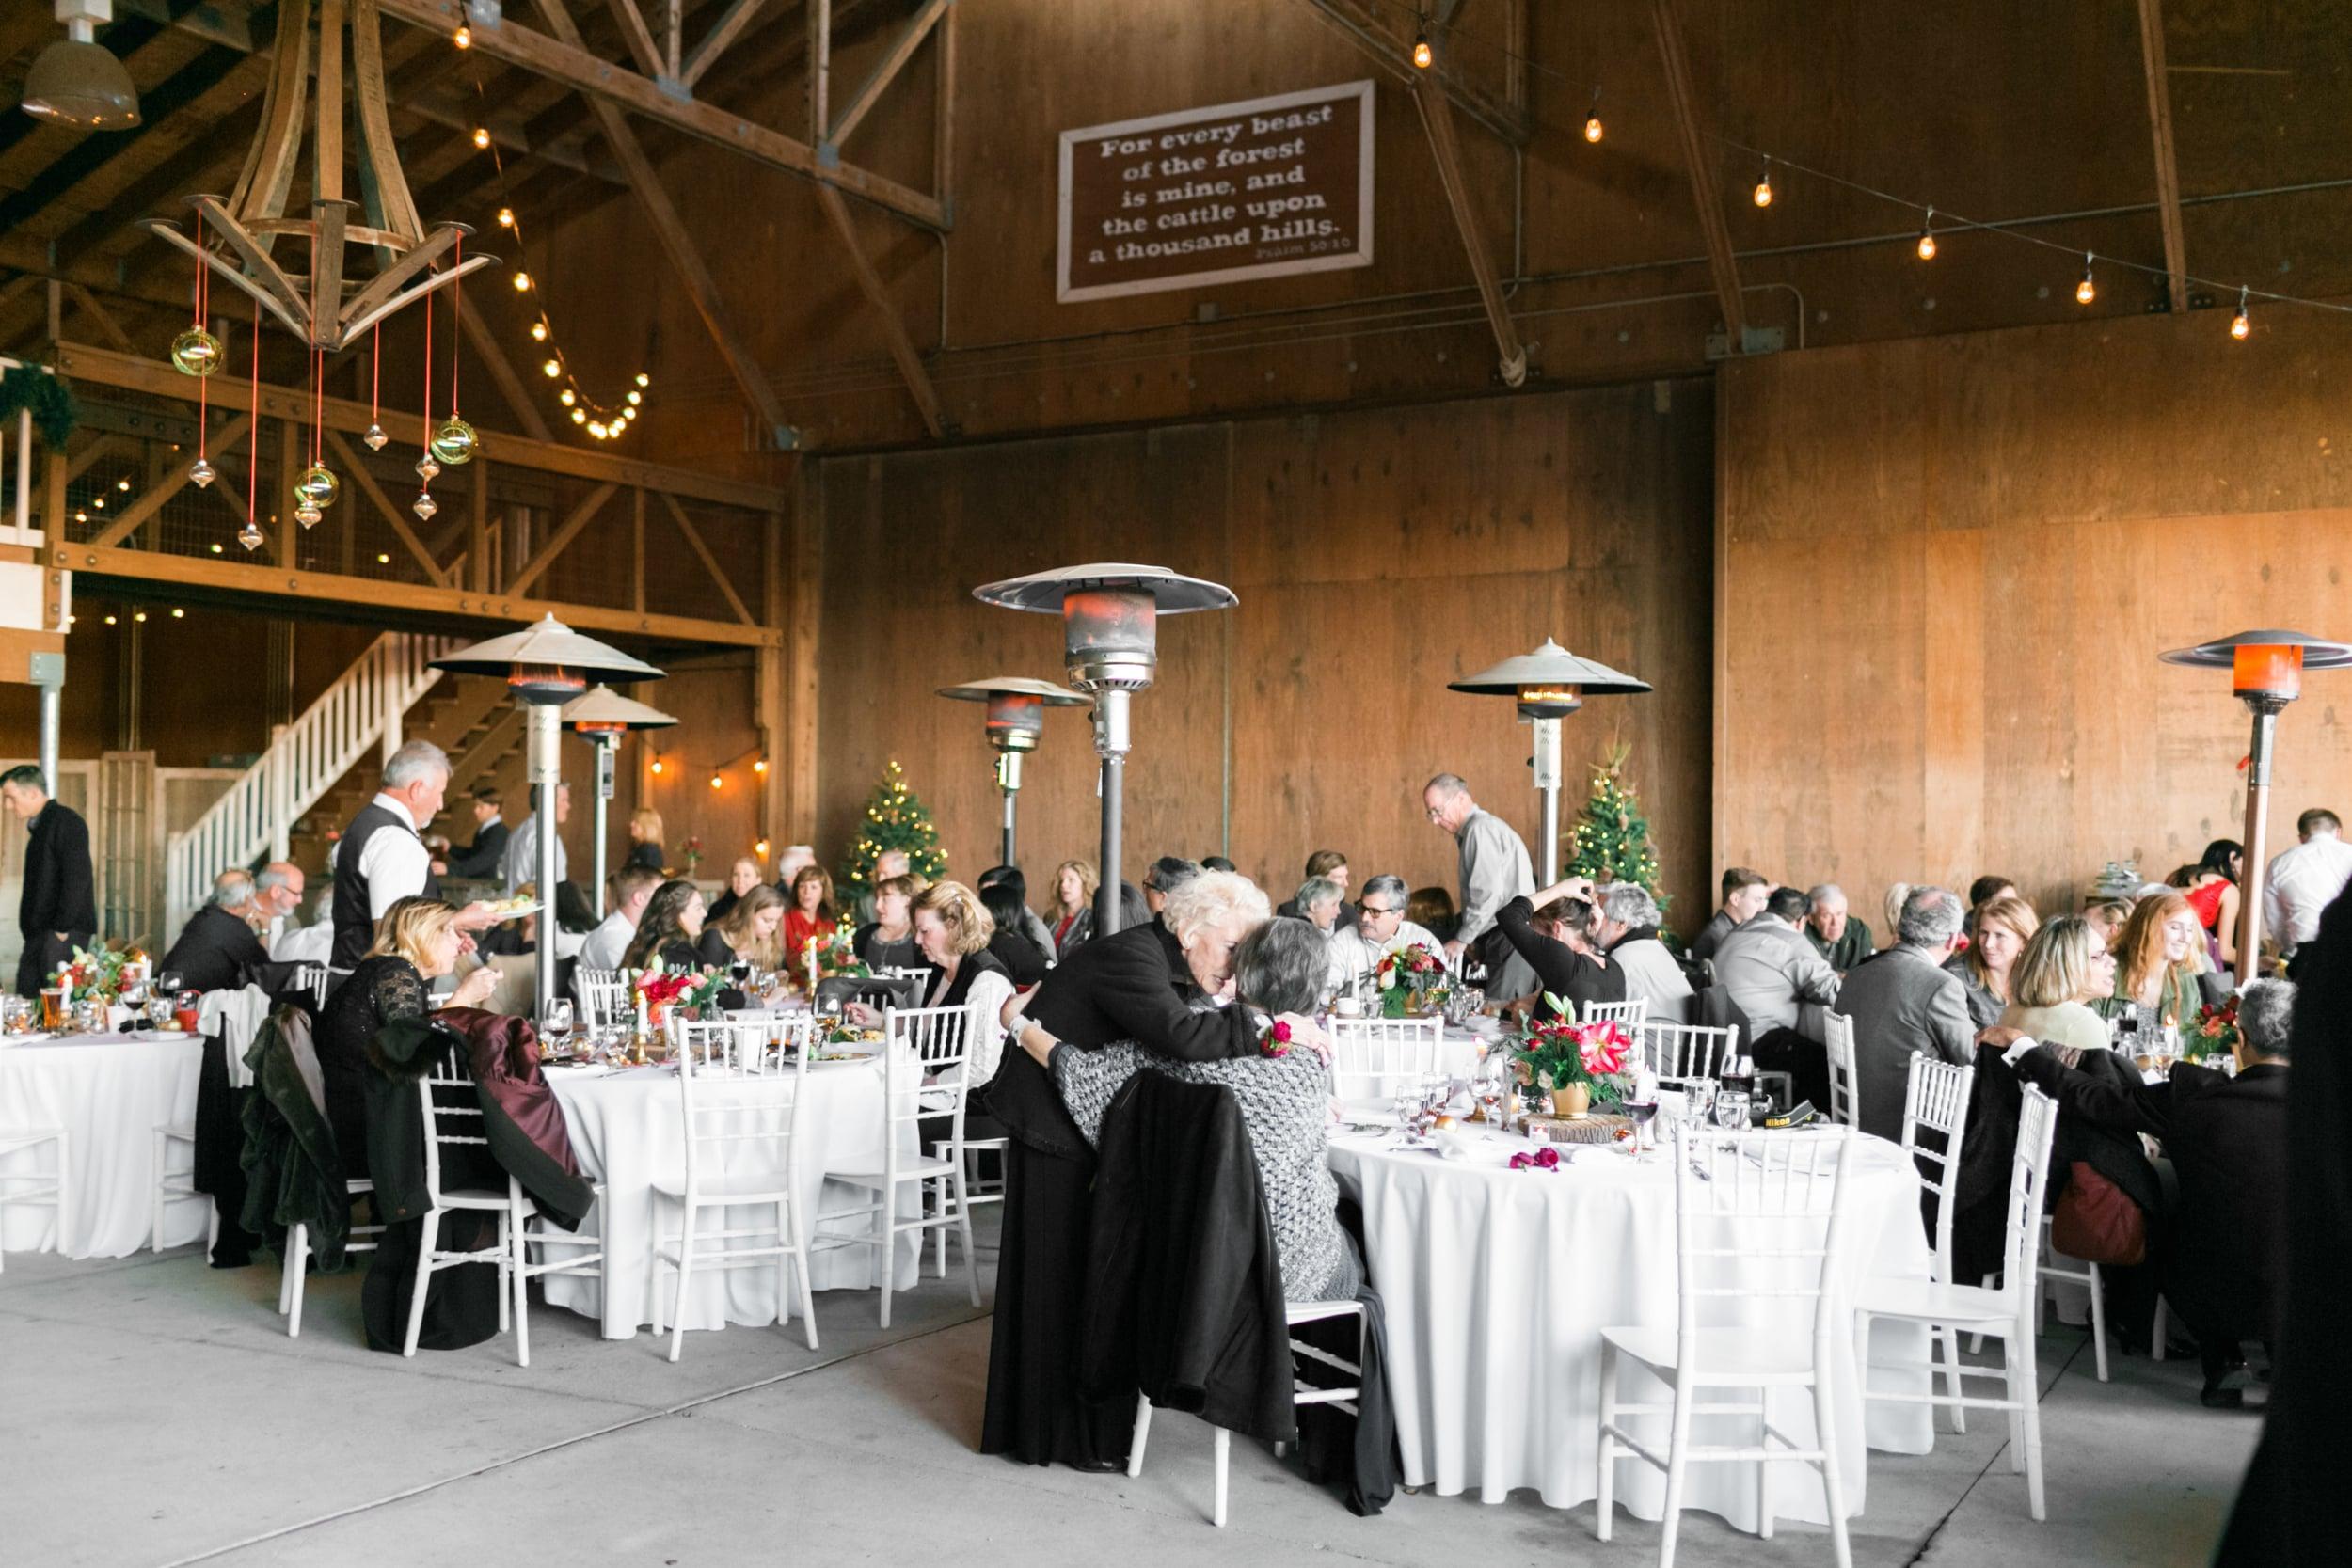 Natalie_Schutt_Photography_Winter_Wedding_San_Luis_Obispo-210.jpg